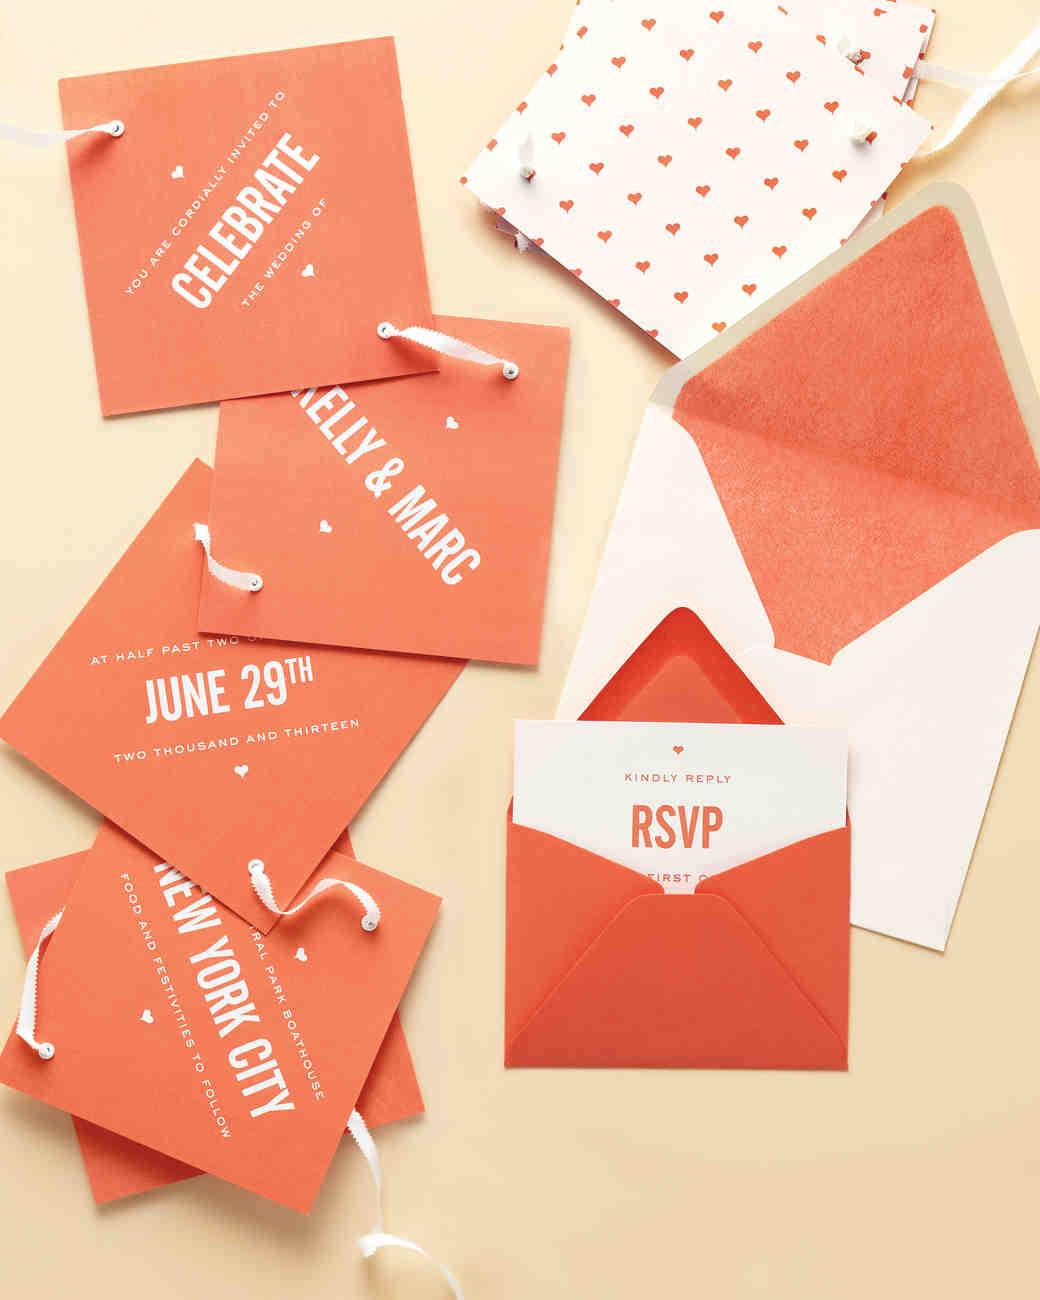 unique wedding invitations martha stewart weddings - Unique Wedding Invitations